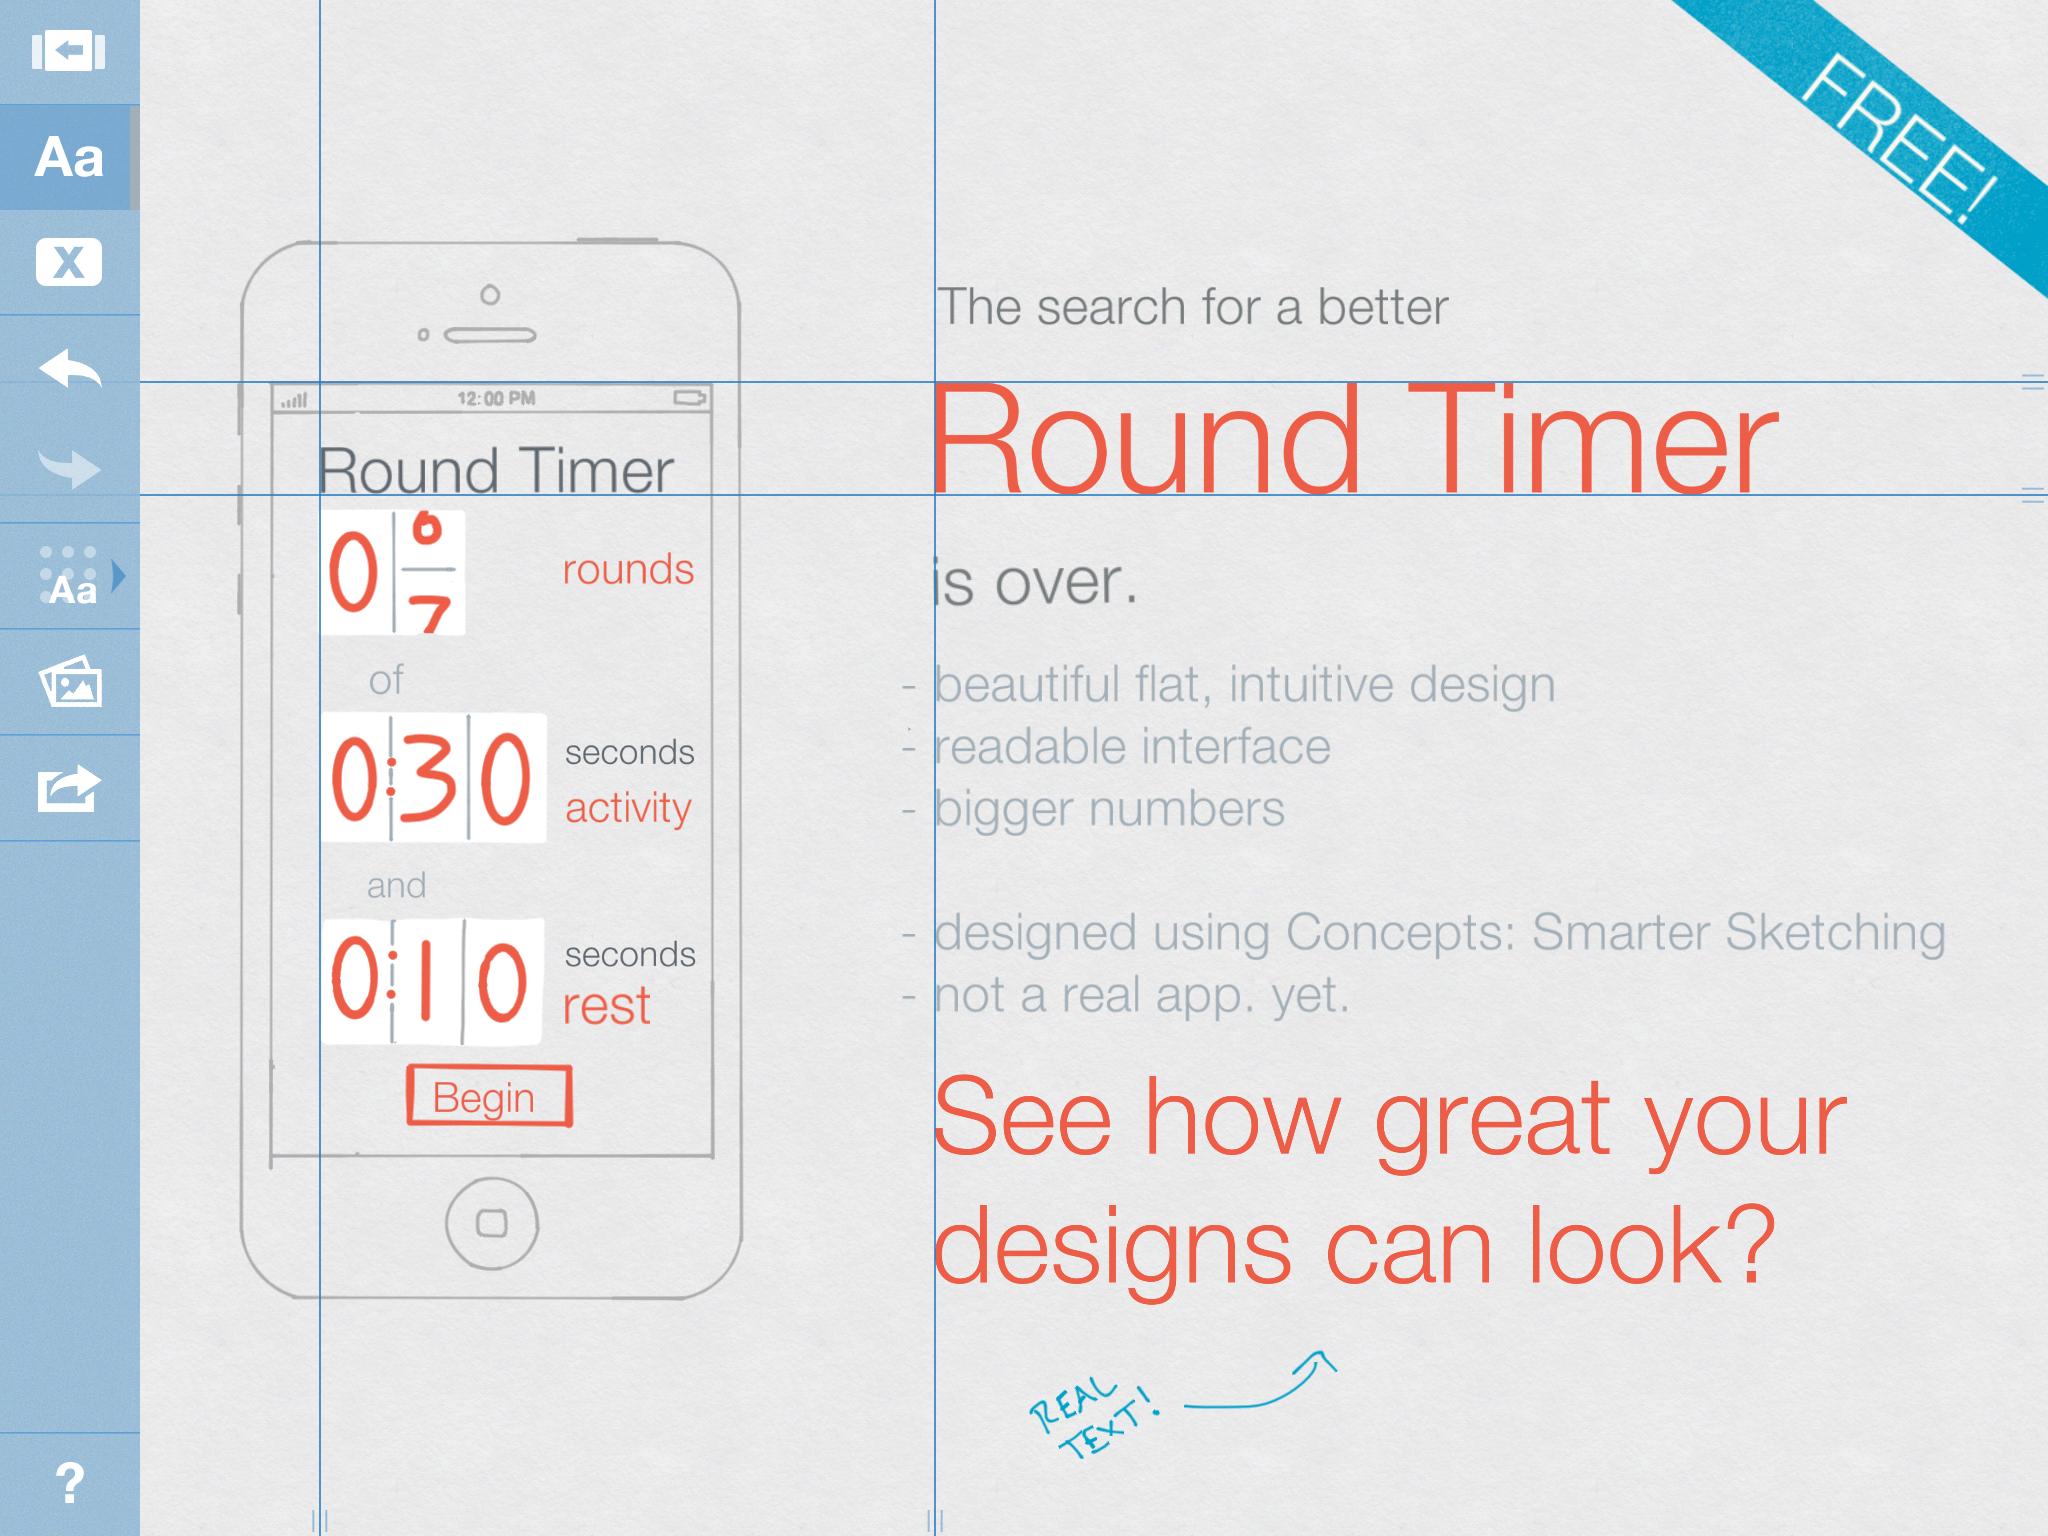 UI design in Concepts 2.0: Smarter Sketching (iPad)